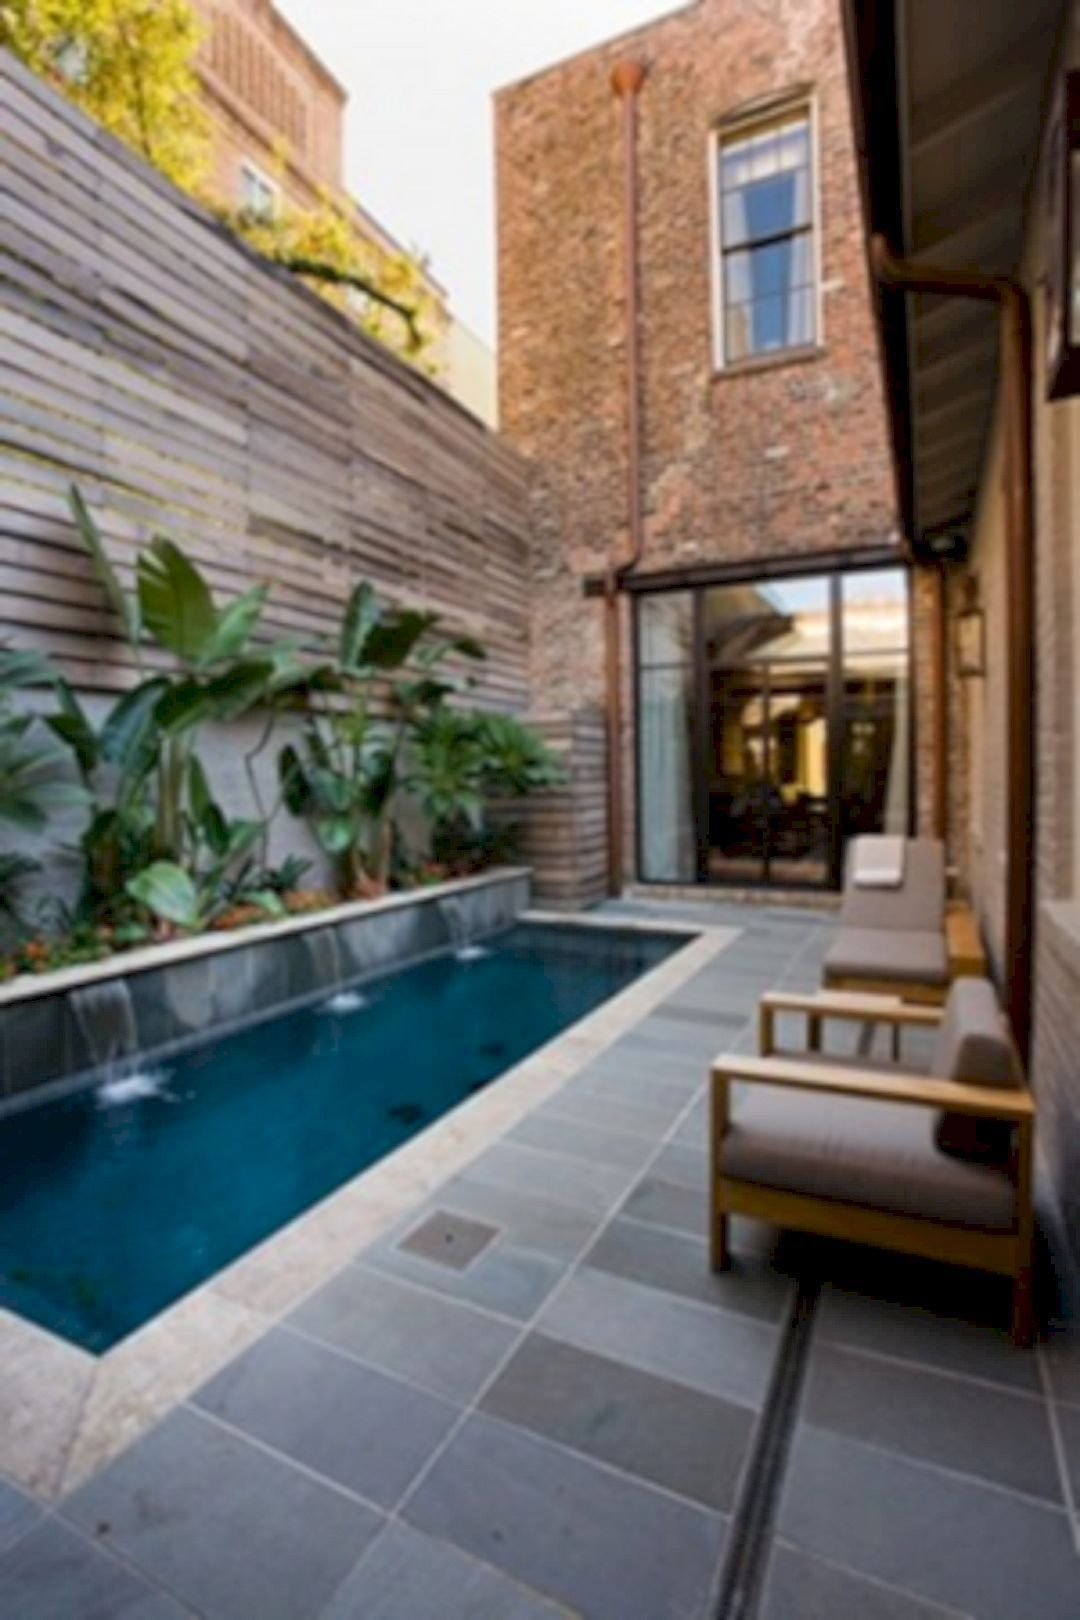 coolest small pool idea for backyard 16 small pool ideas small